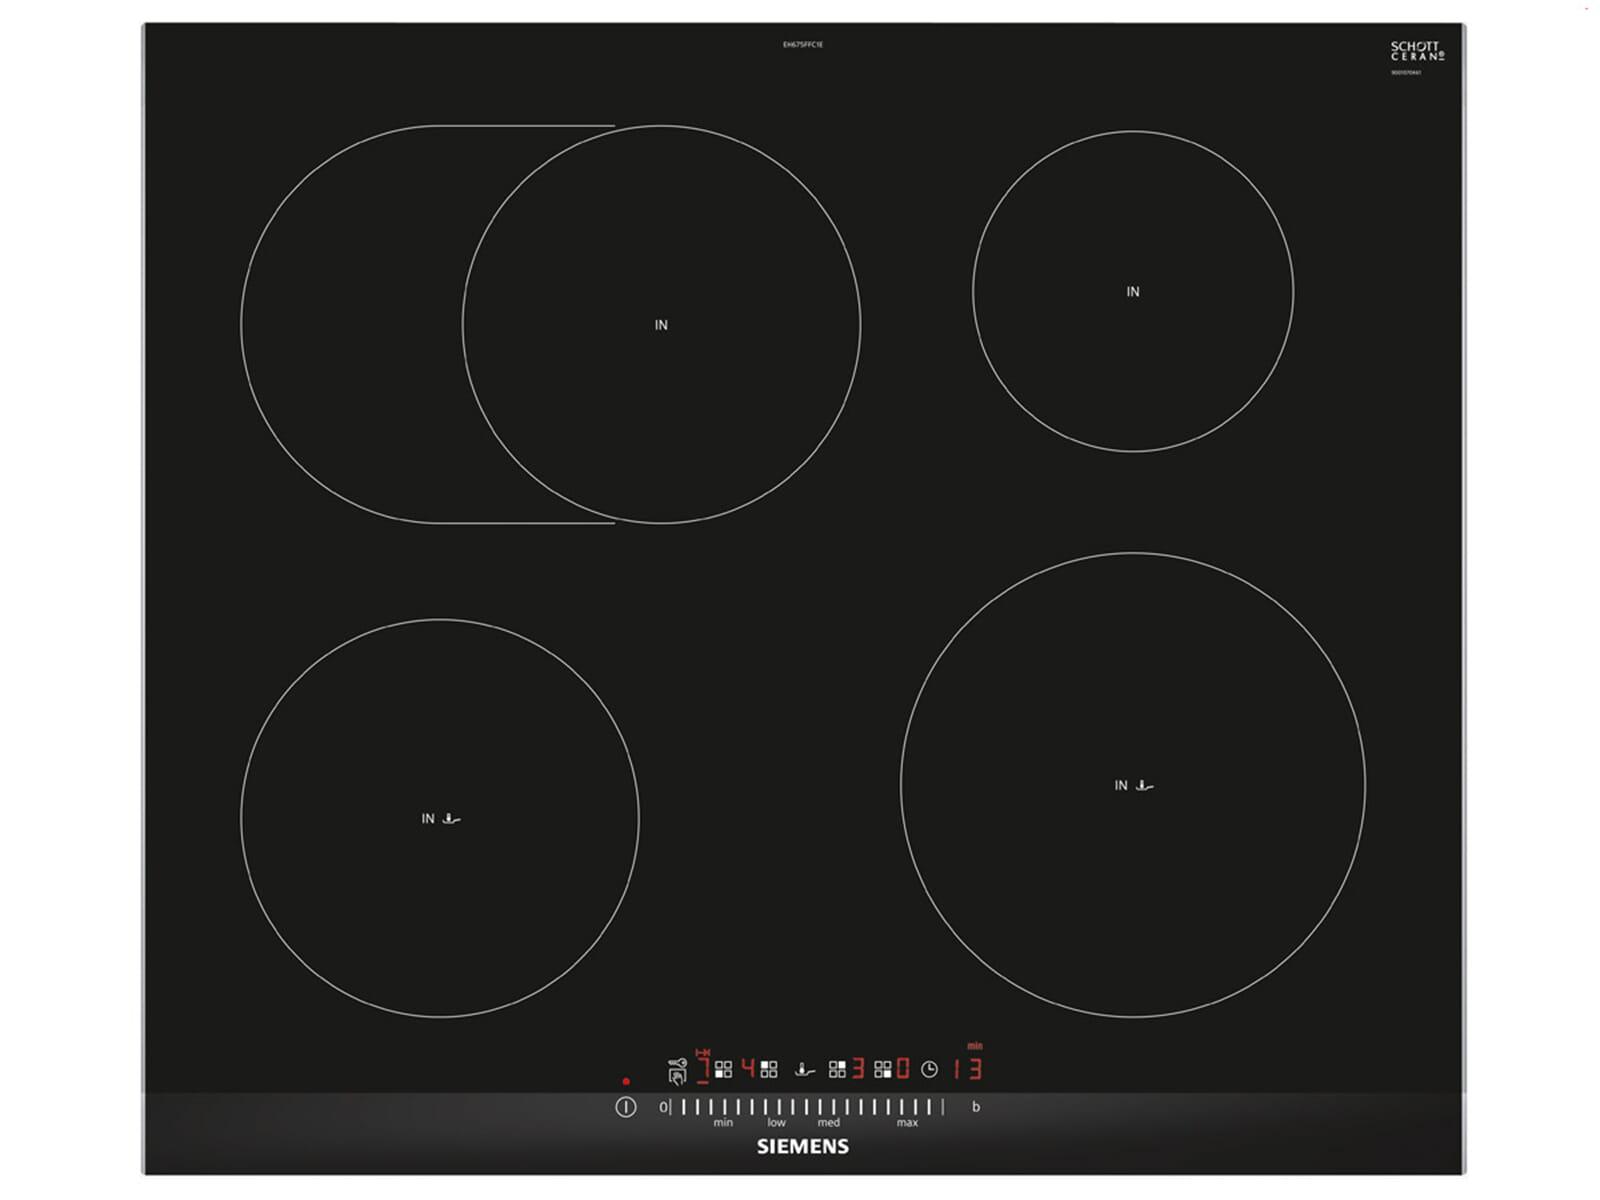 siemens eh675ffc1e induktionskochfeld autark. Black Bedroom Furniture Sets. Home Design Ideas